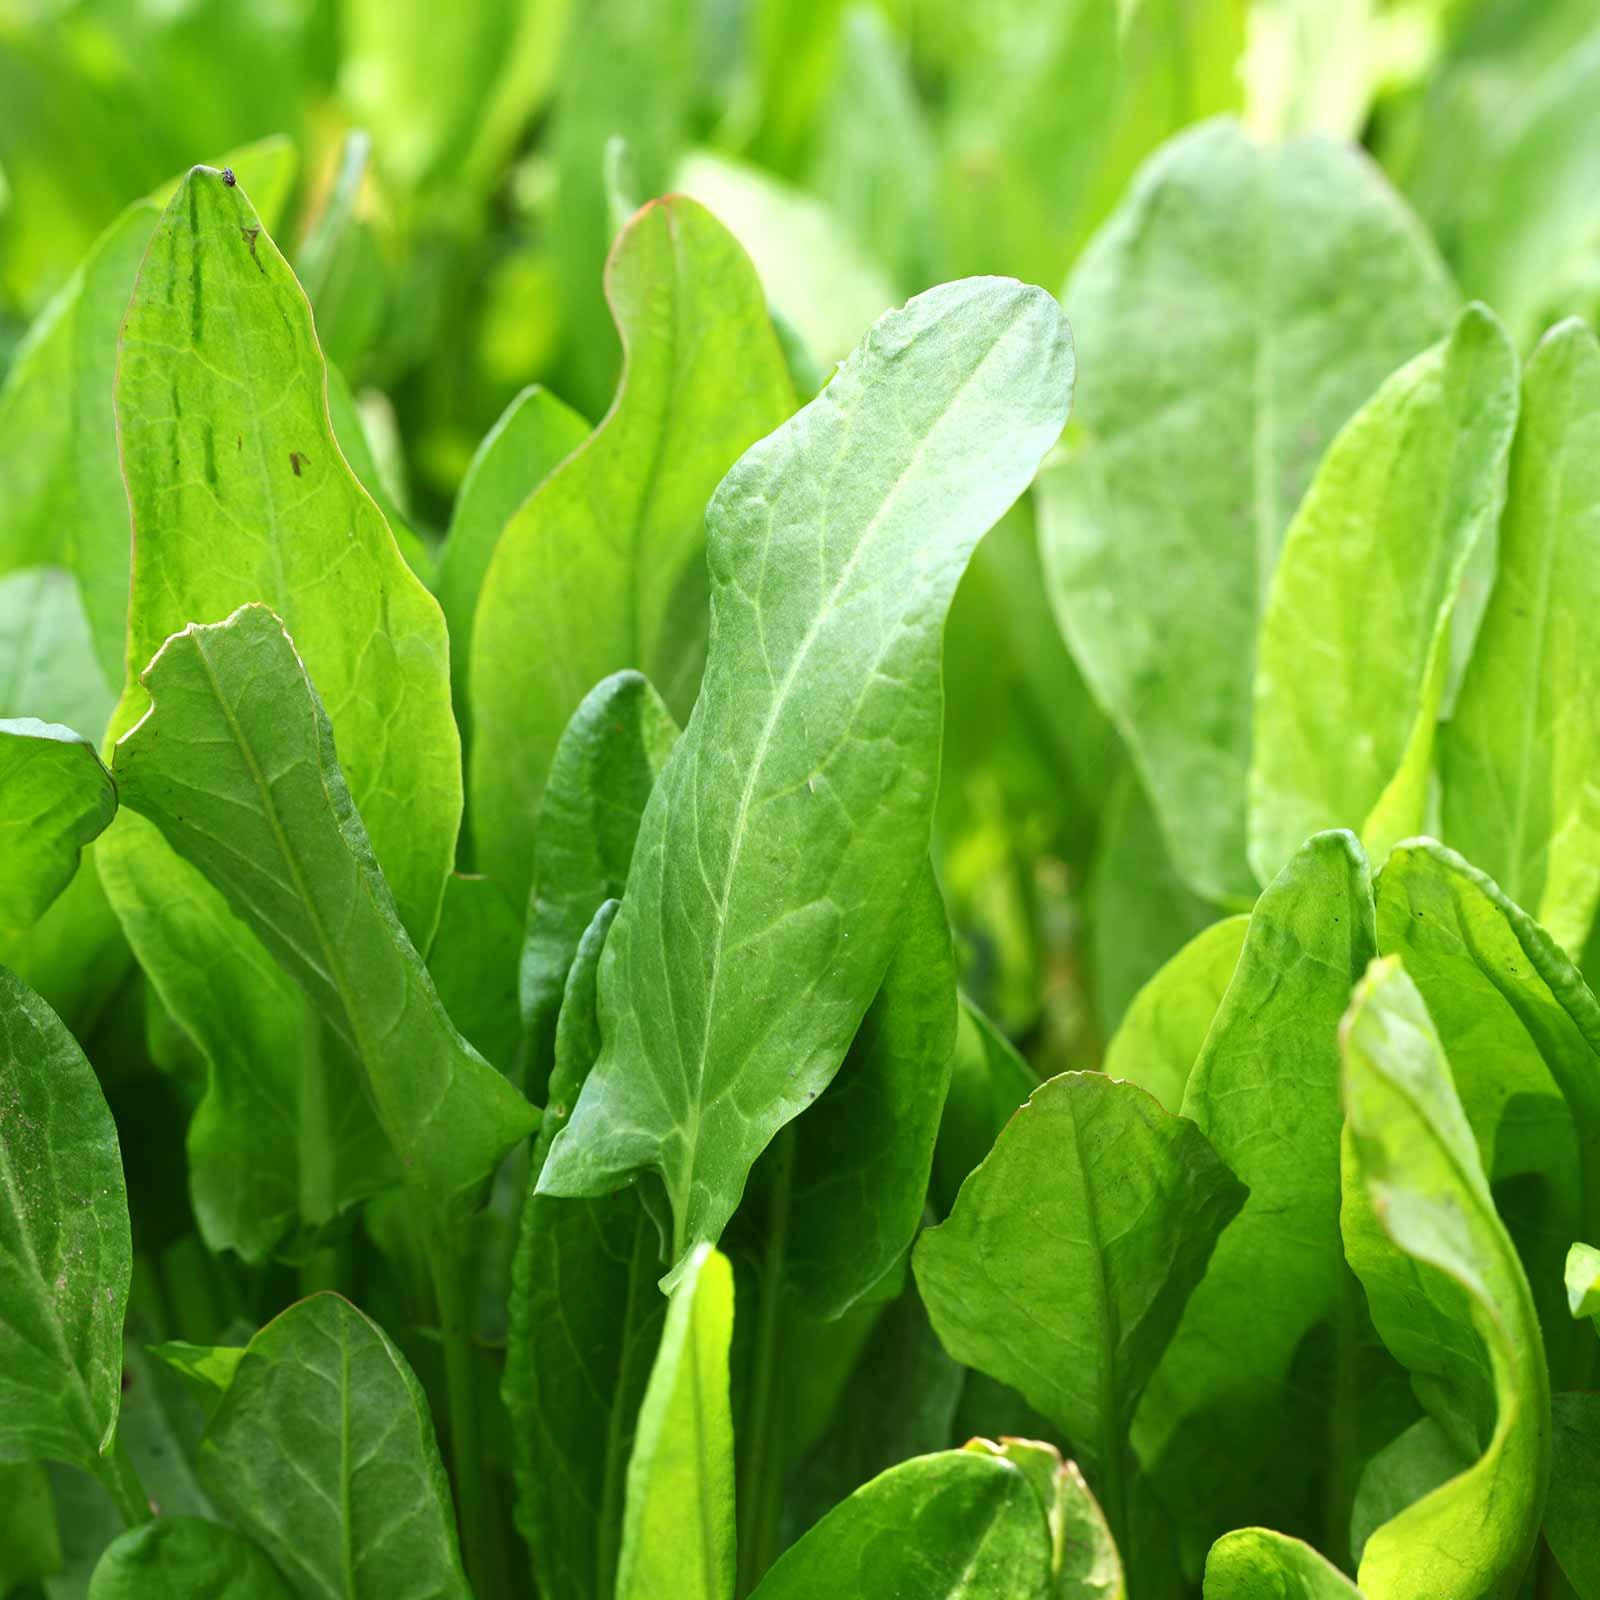 Bulk herbs wholesale - Microgreens Seeds Large Leaf Sorrel 1 Lb Bulk Wholesale Micro Herbs